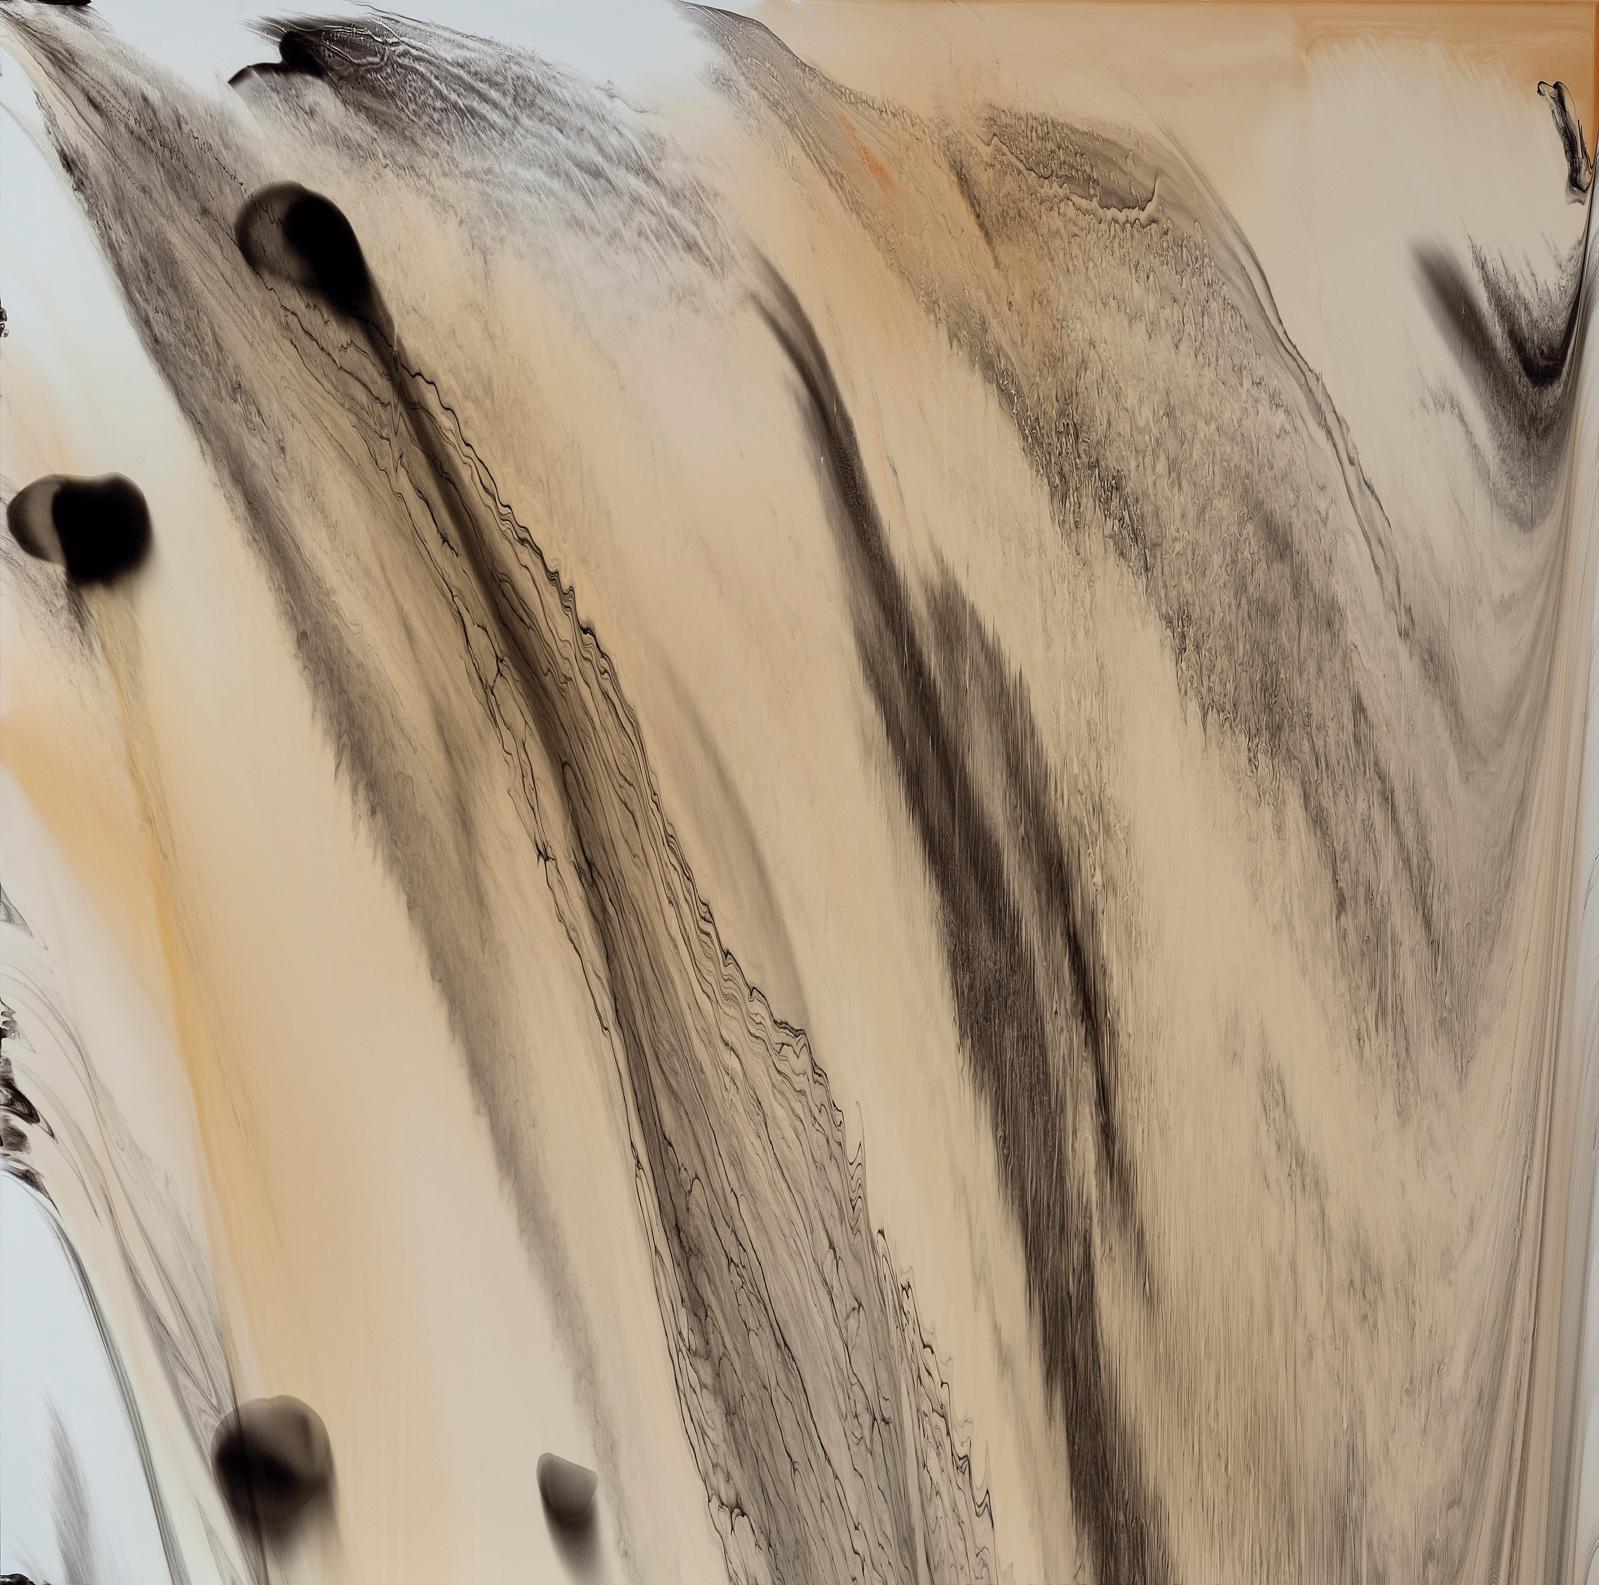 Yacout Kabbaj, TheiOSbug, 2018, peinture sur aluminium, 130x130cm (détail). COURTESY YACOUT KABBAJ